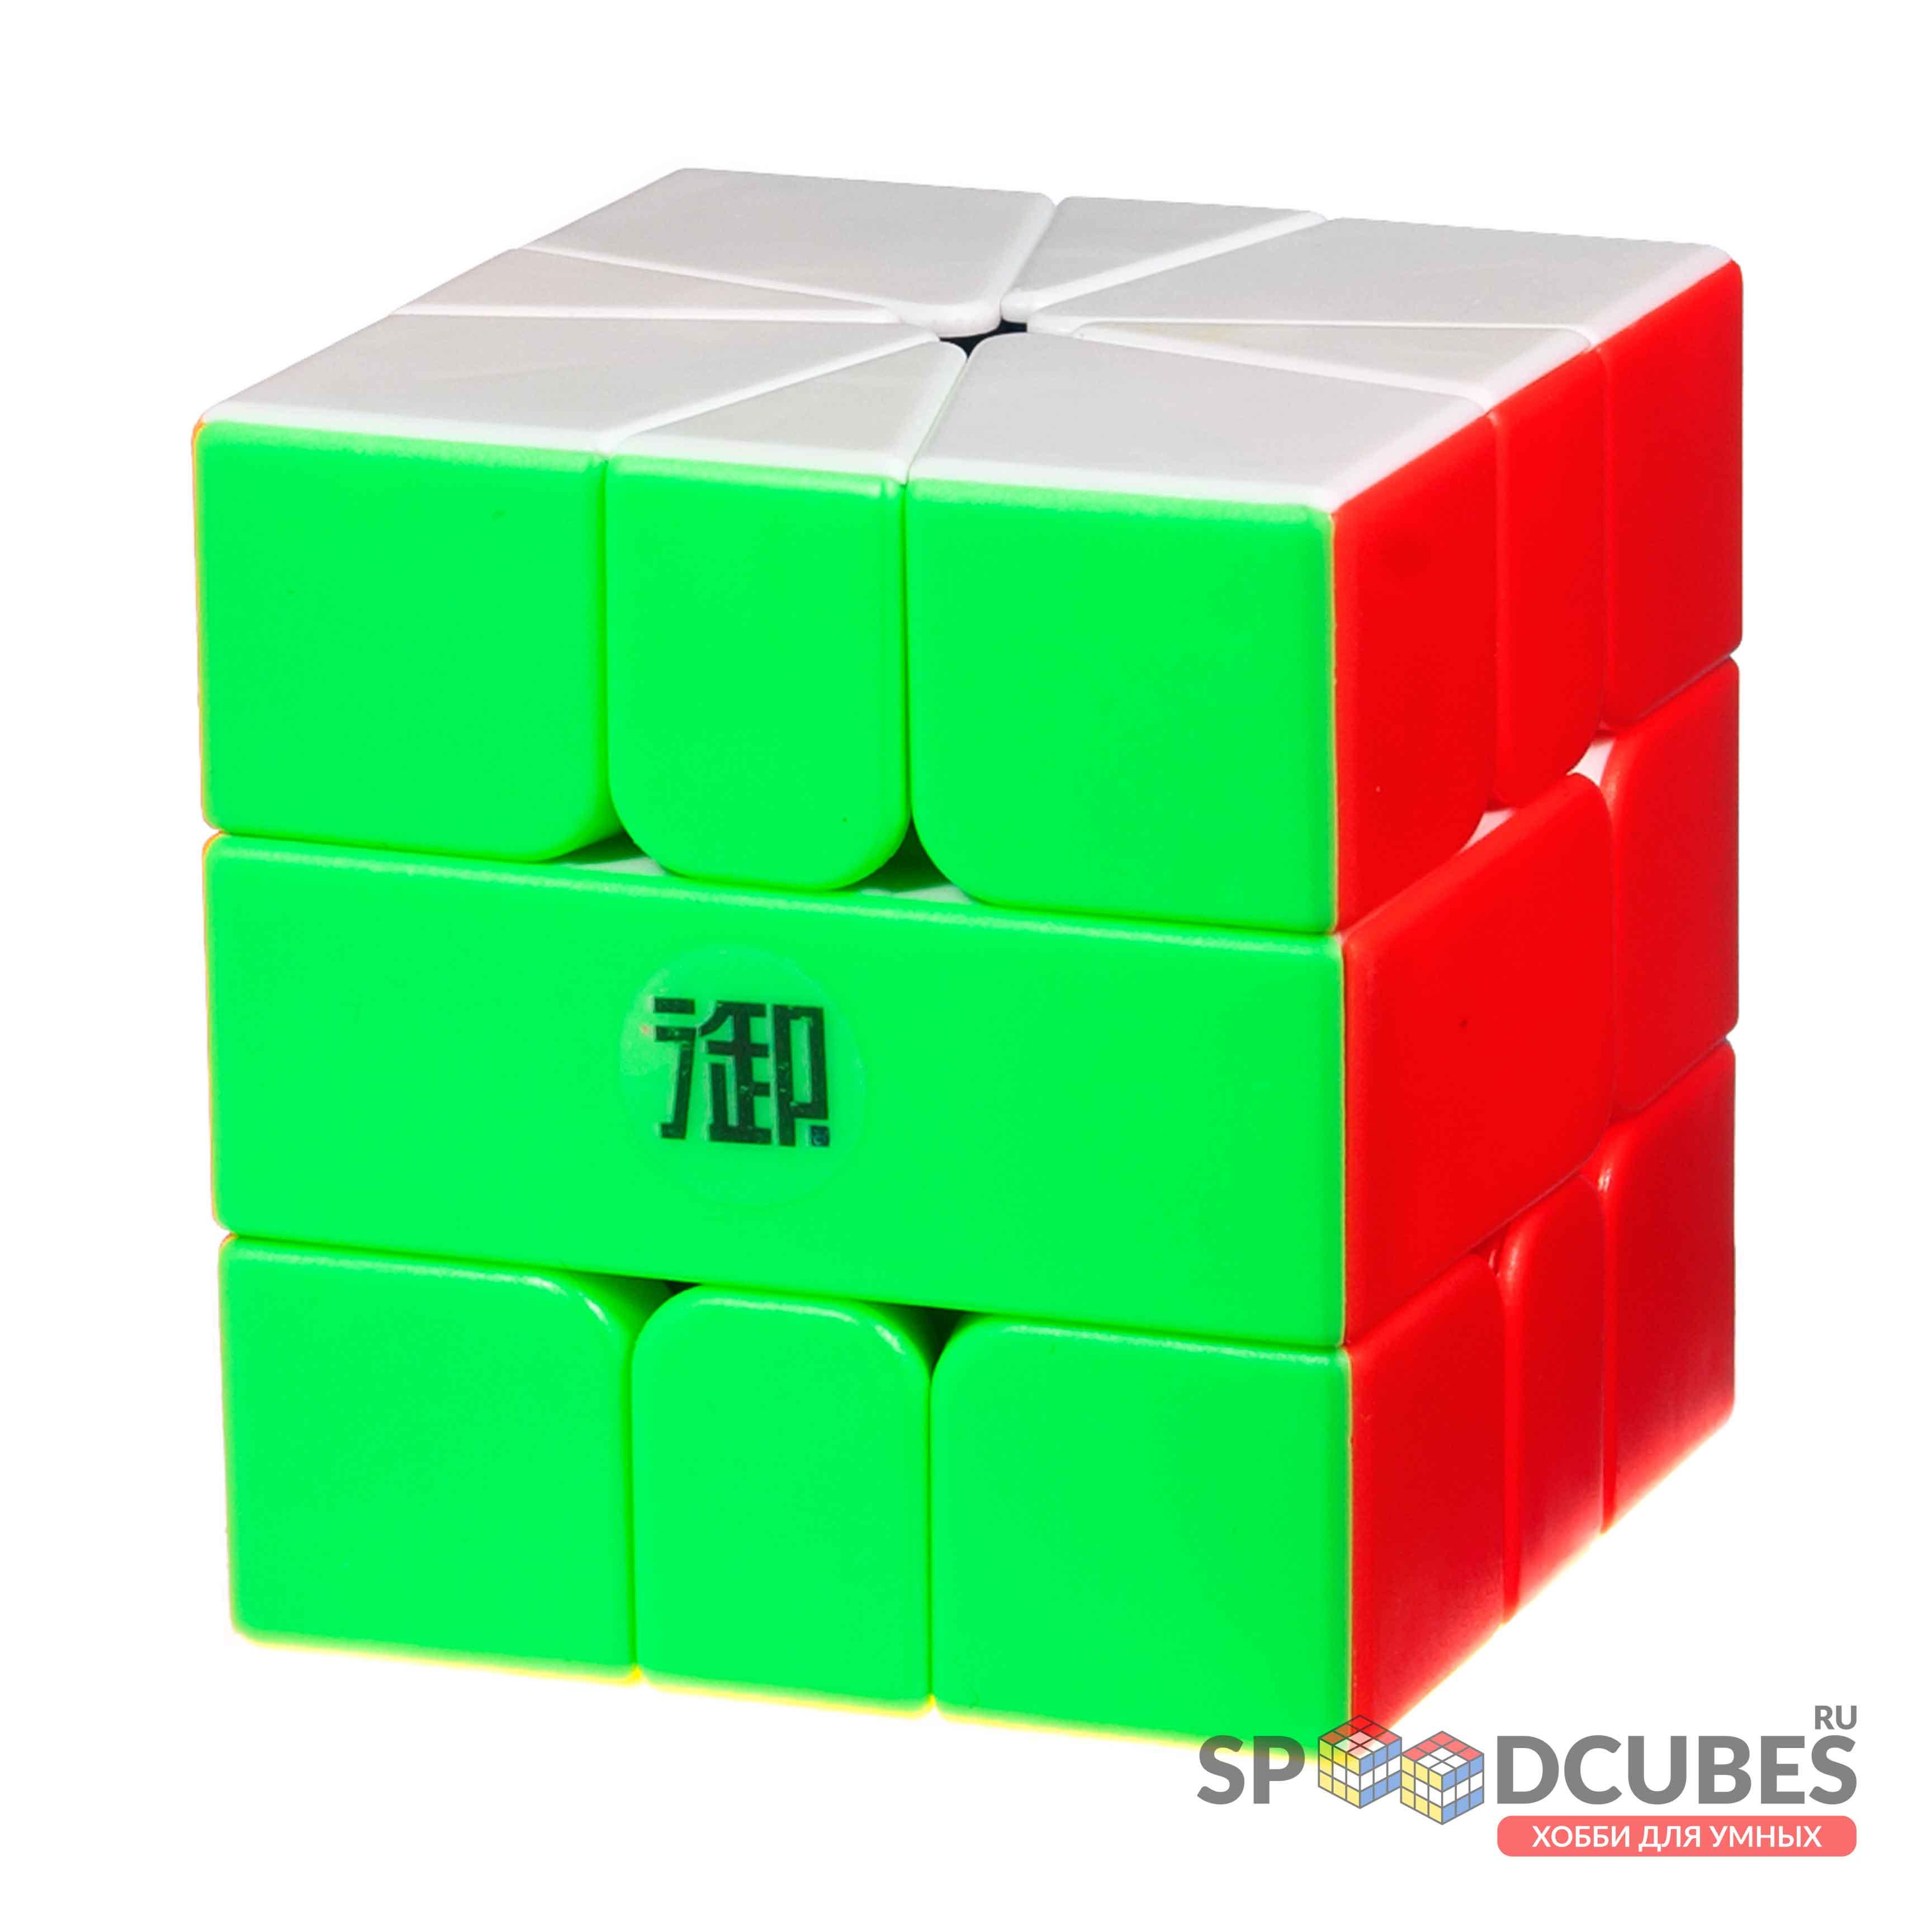 KungFu Square-1